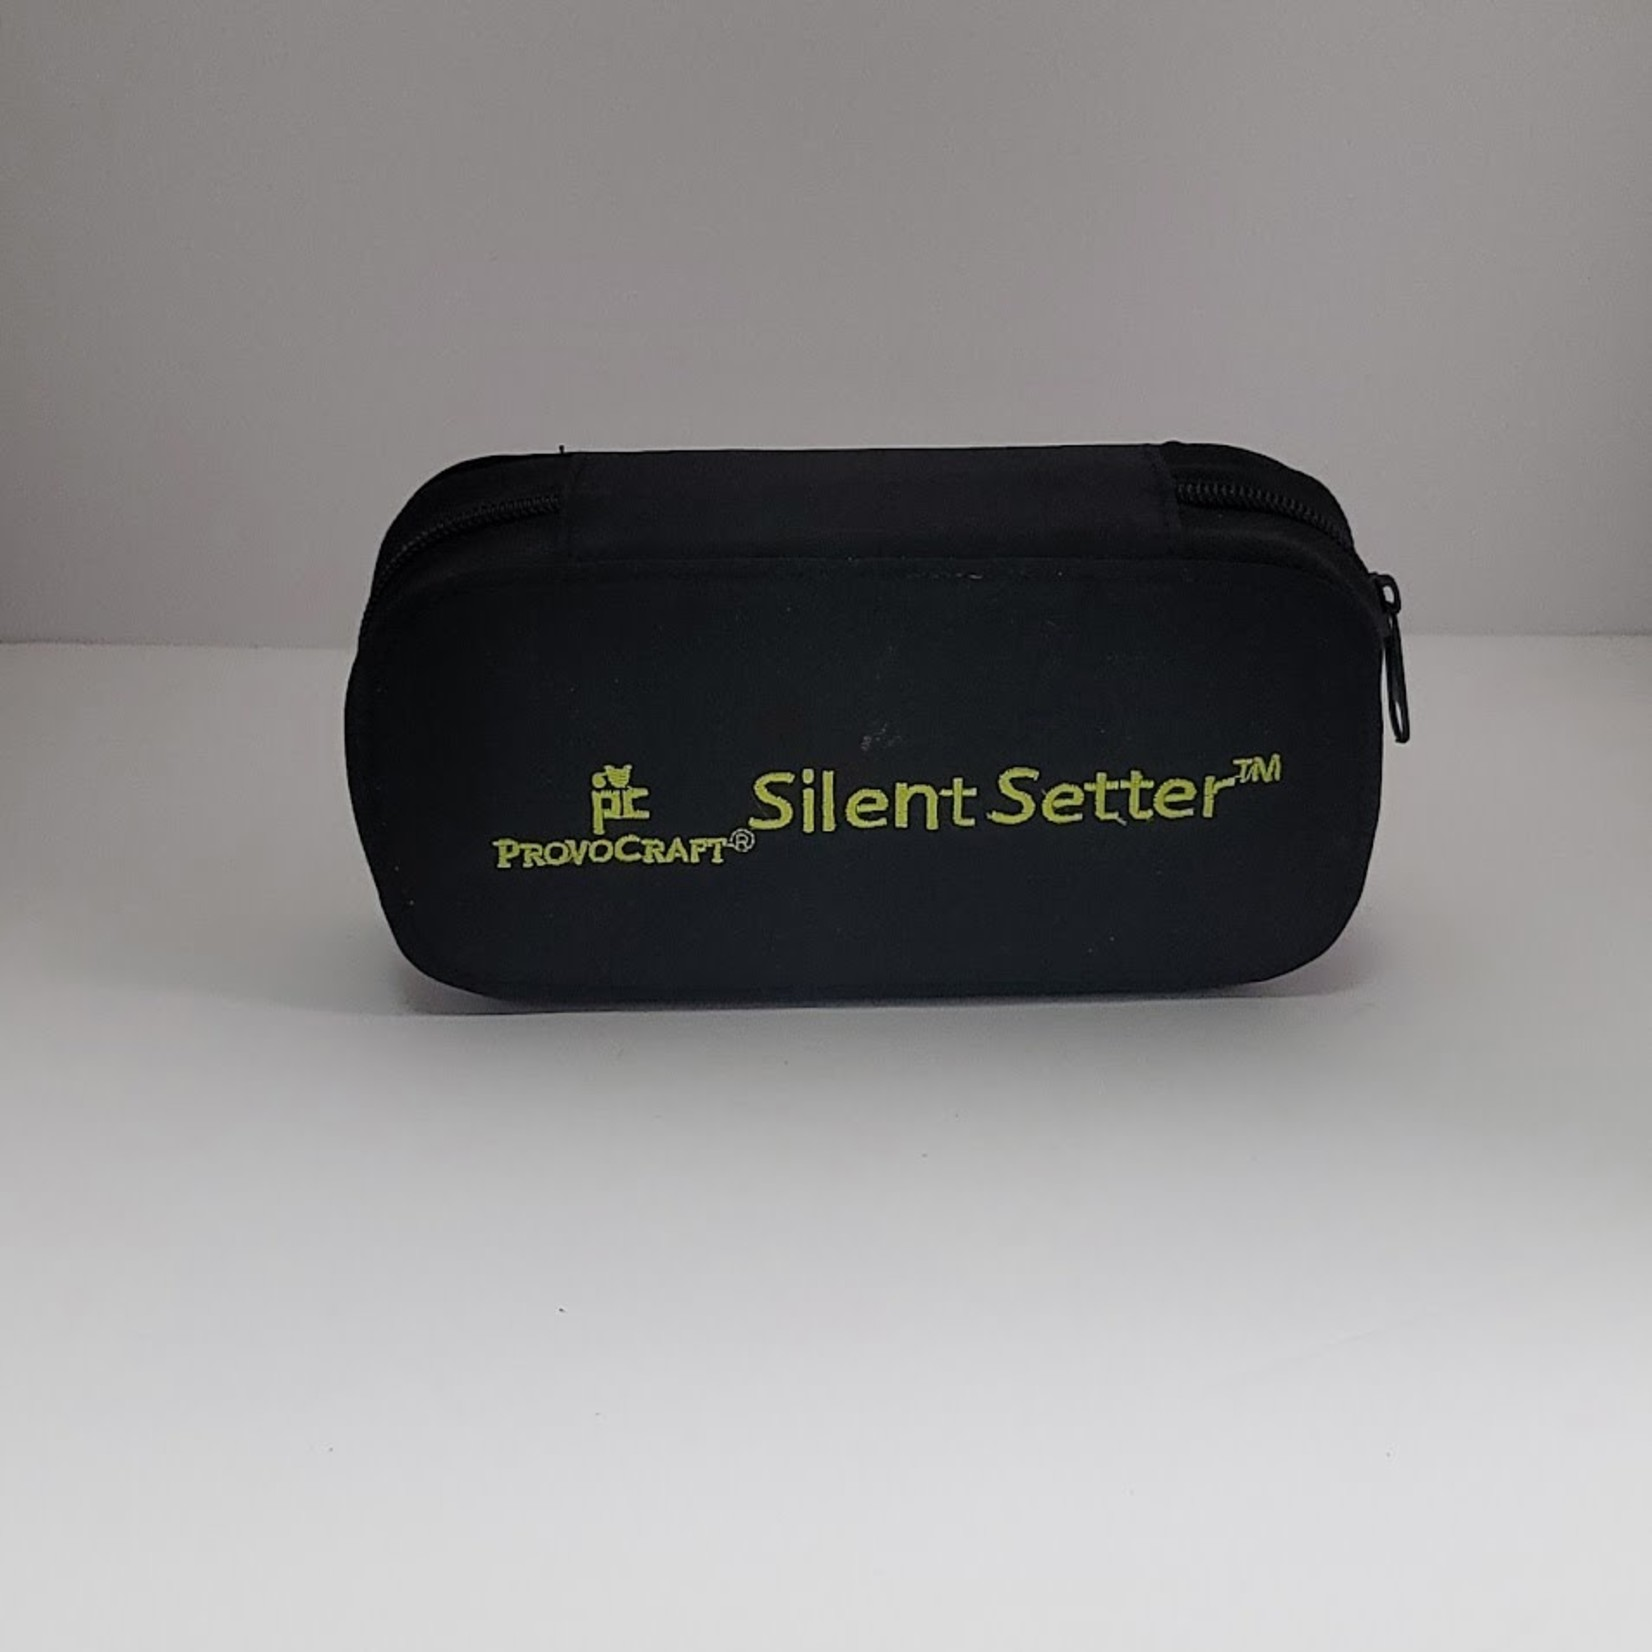 ProvoCraft - Silent Setter